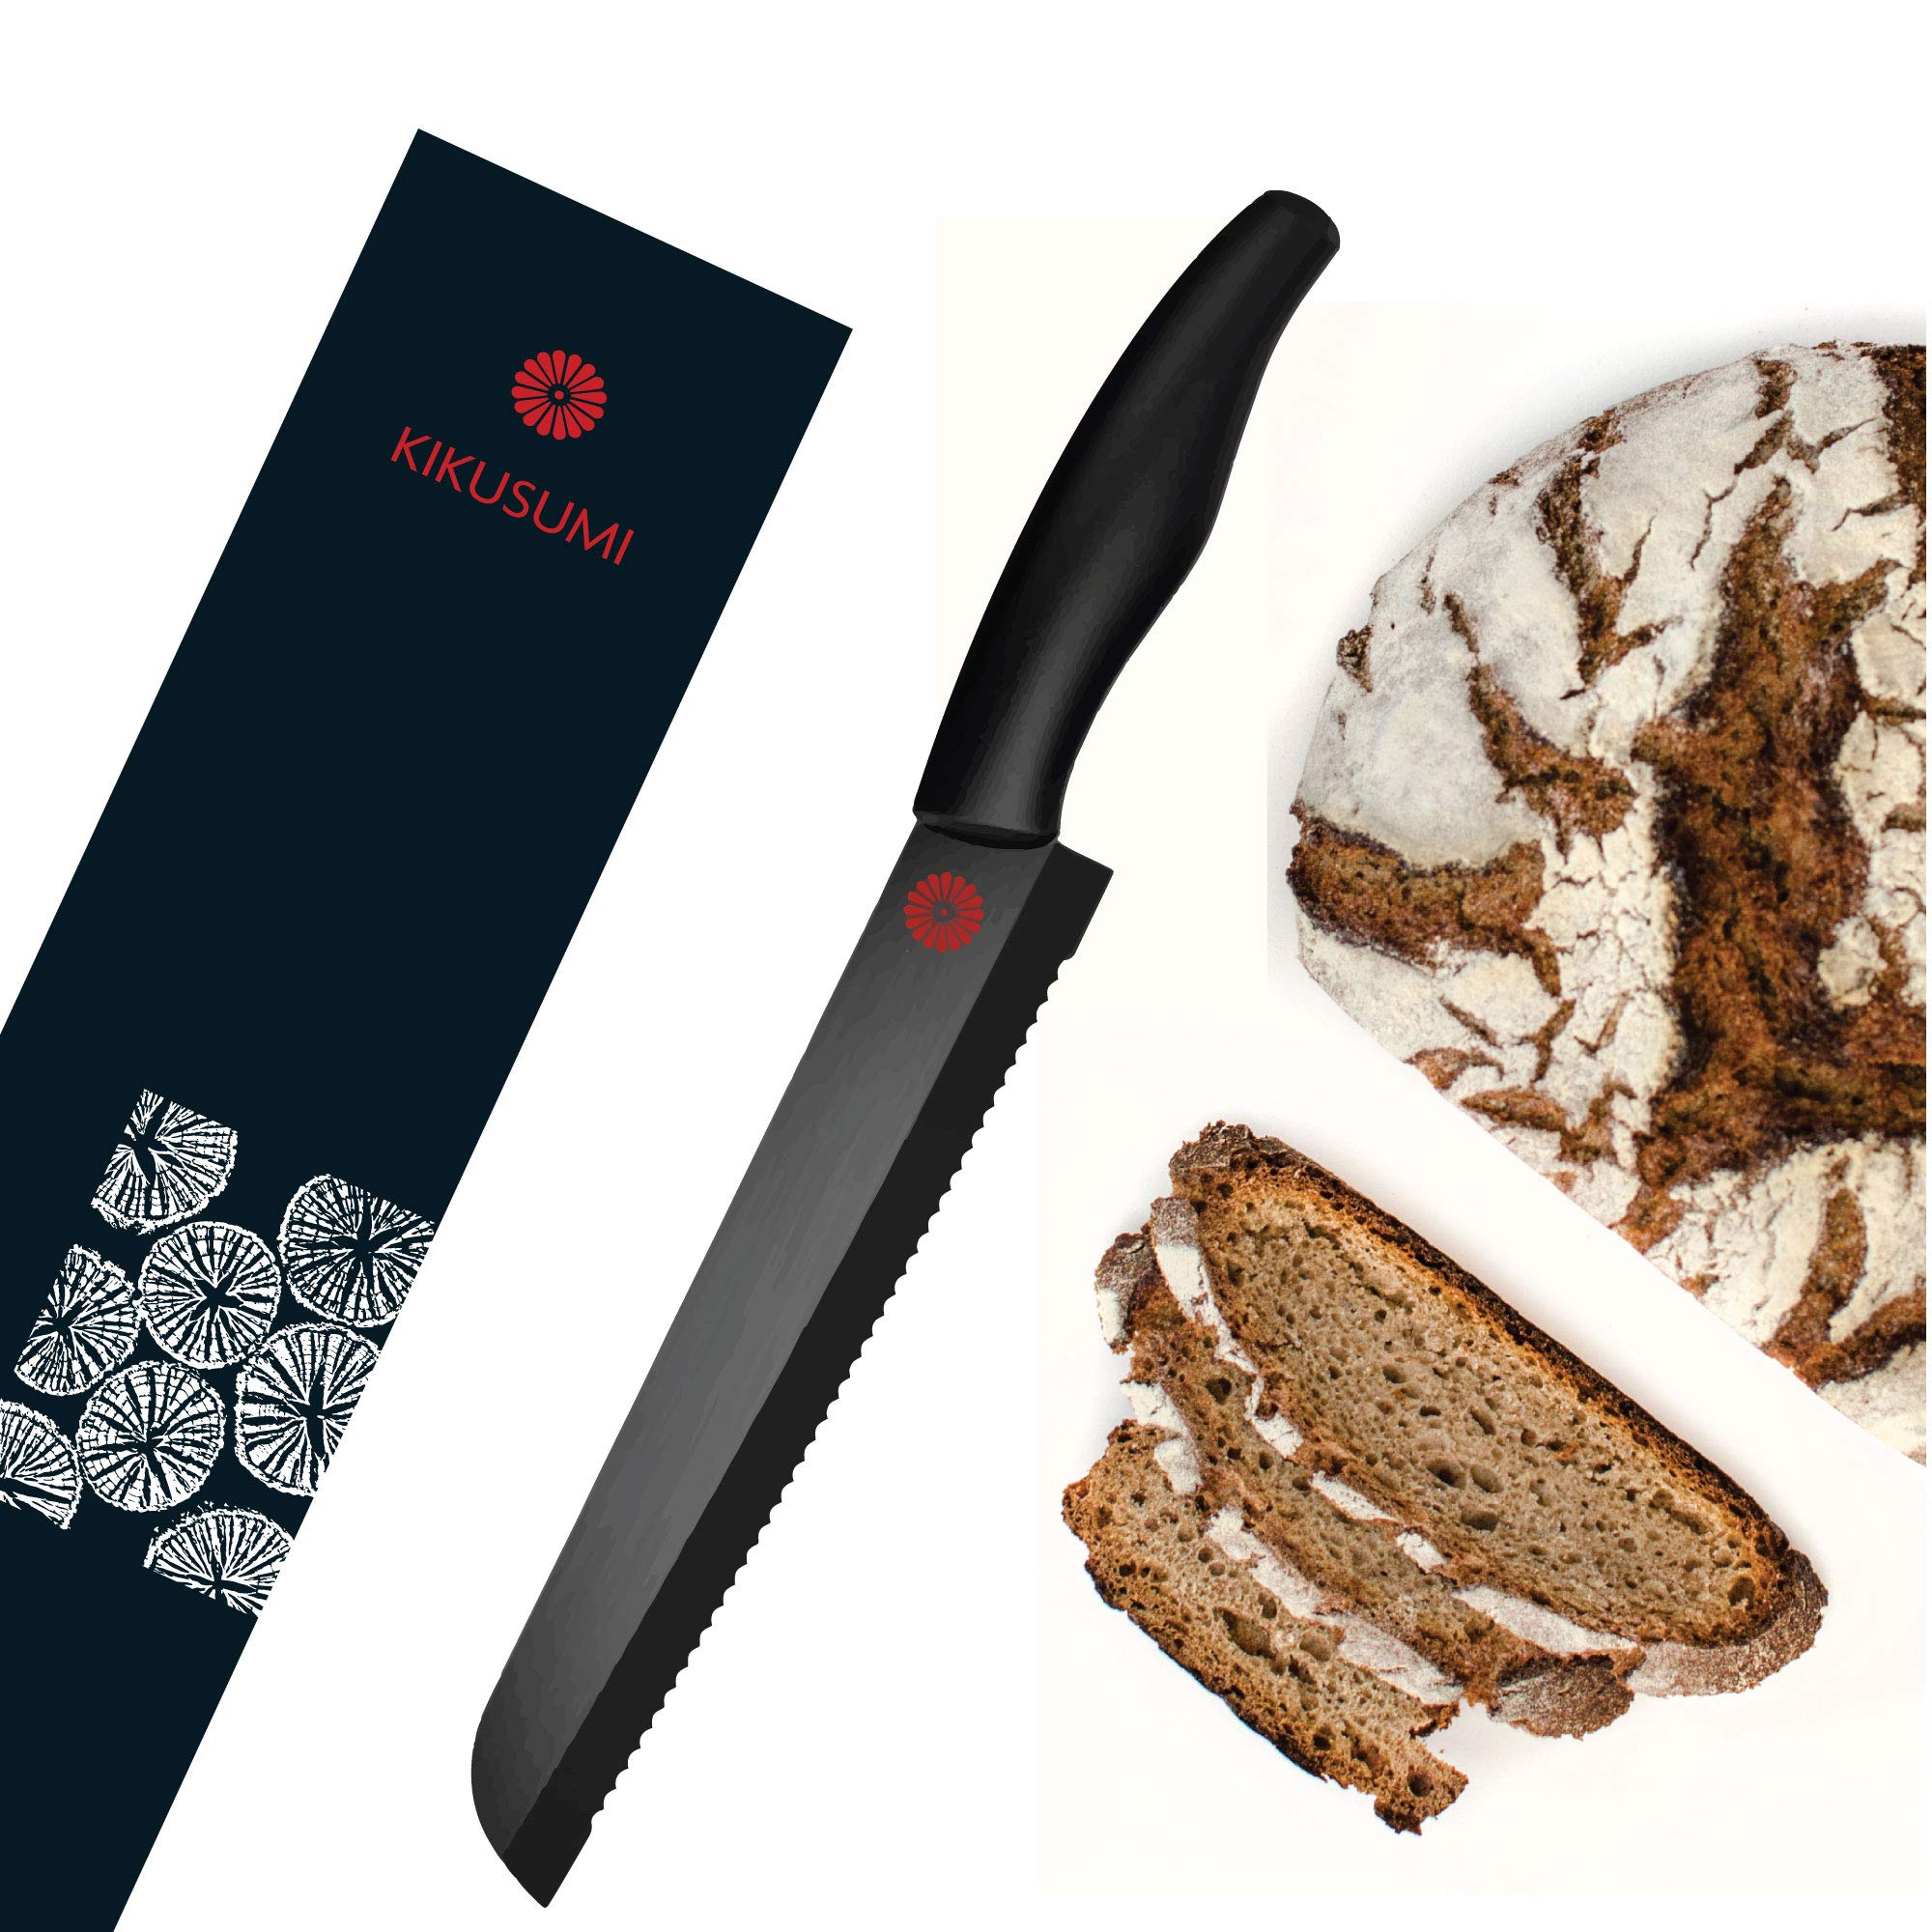 Kikusumi Bread Knife Set + Black Ceramic Blade - 8 inch Serrated Knife + Luxury Magnetic Gift Box + 1 Custom Knife Sheath (black)